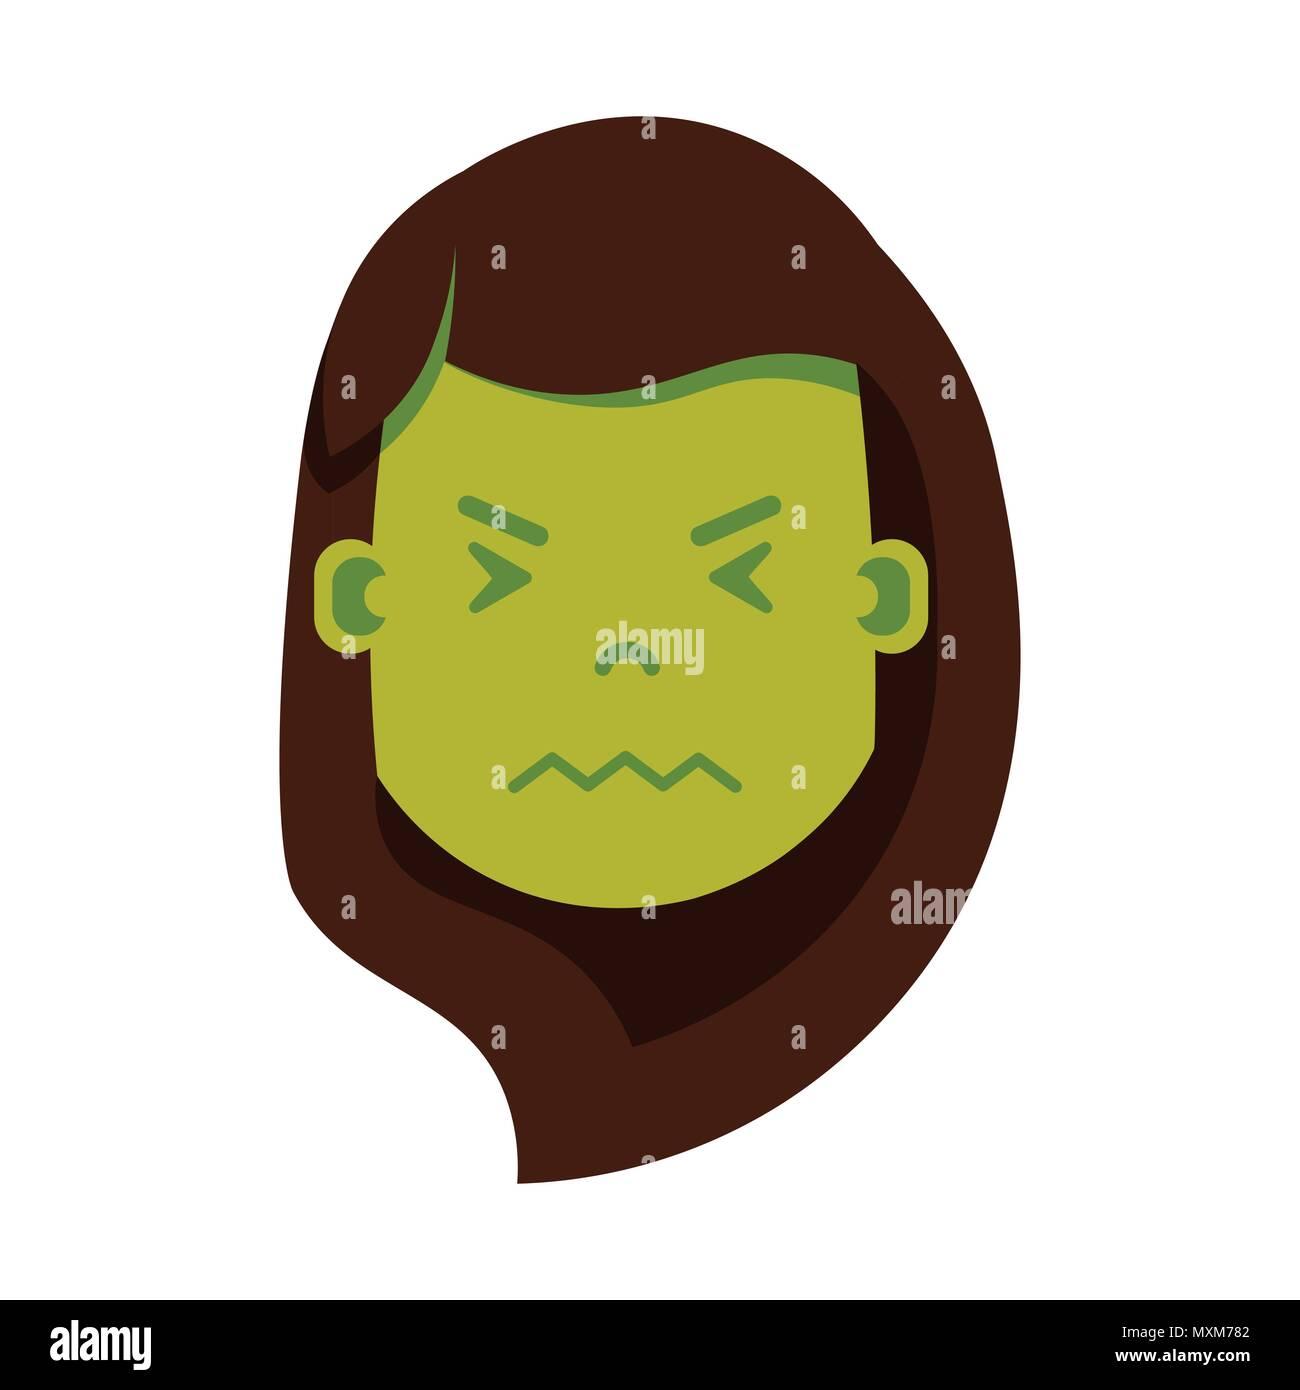 Girl Head Emoji Personage Icon With Facial Emotions Avatar